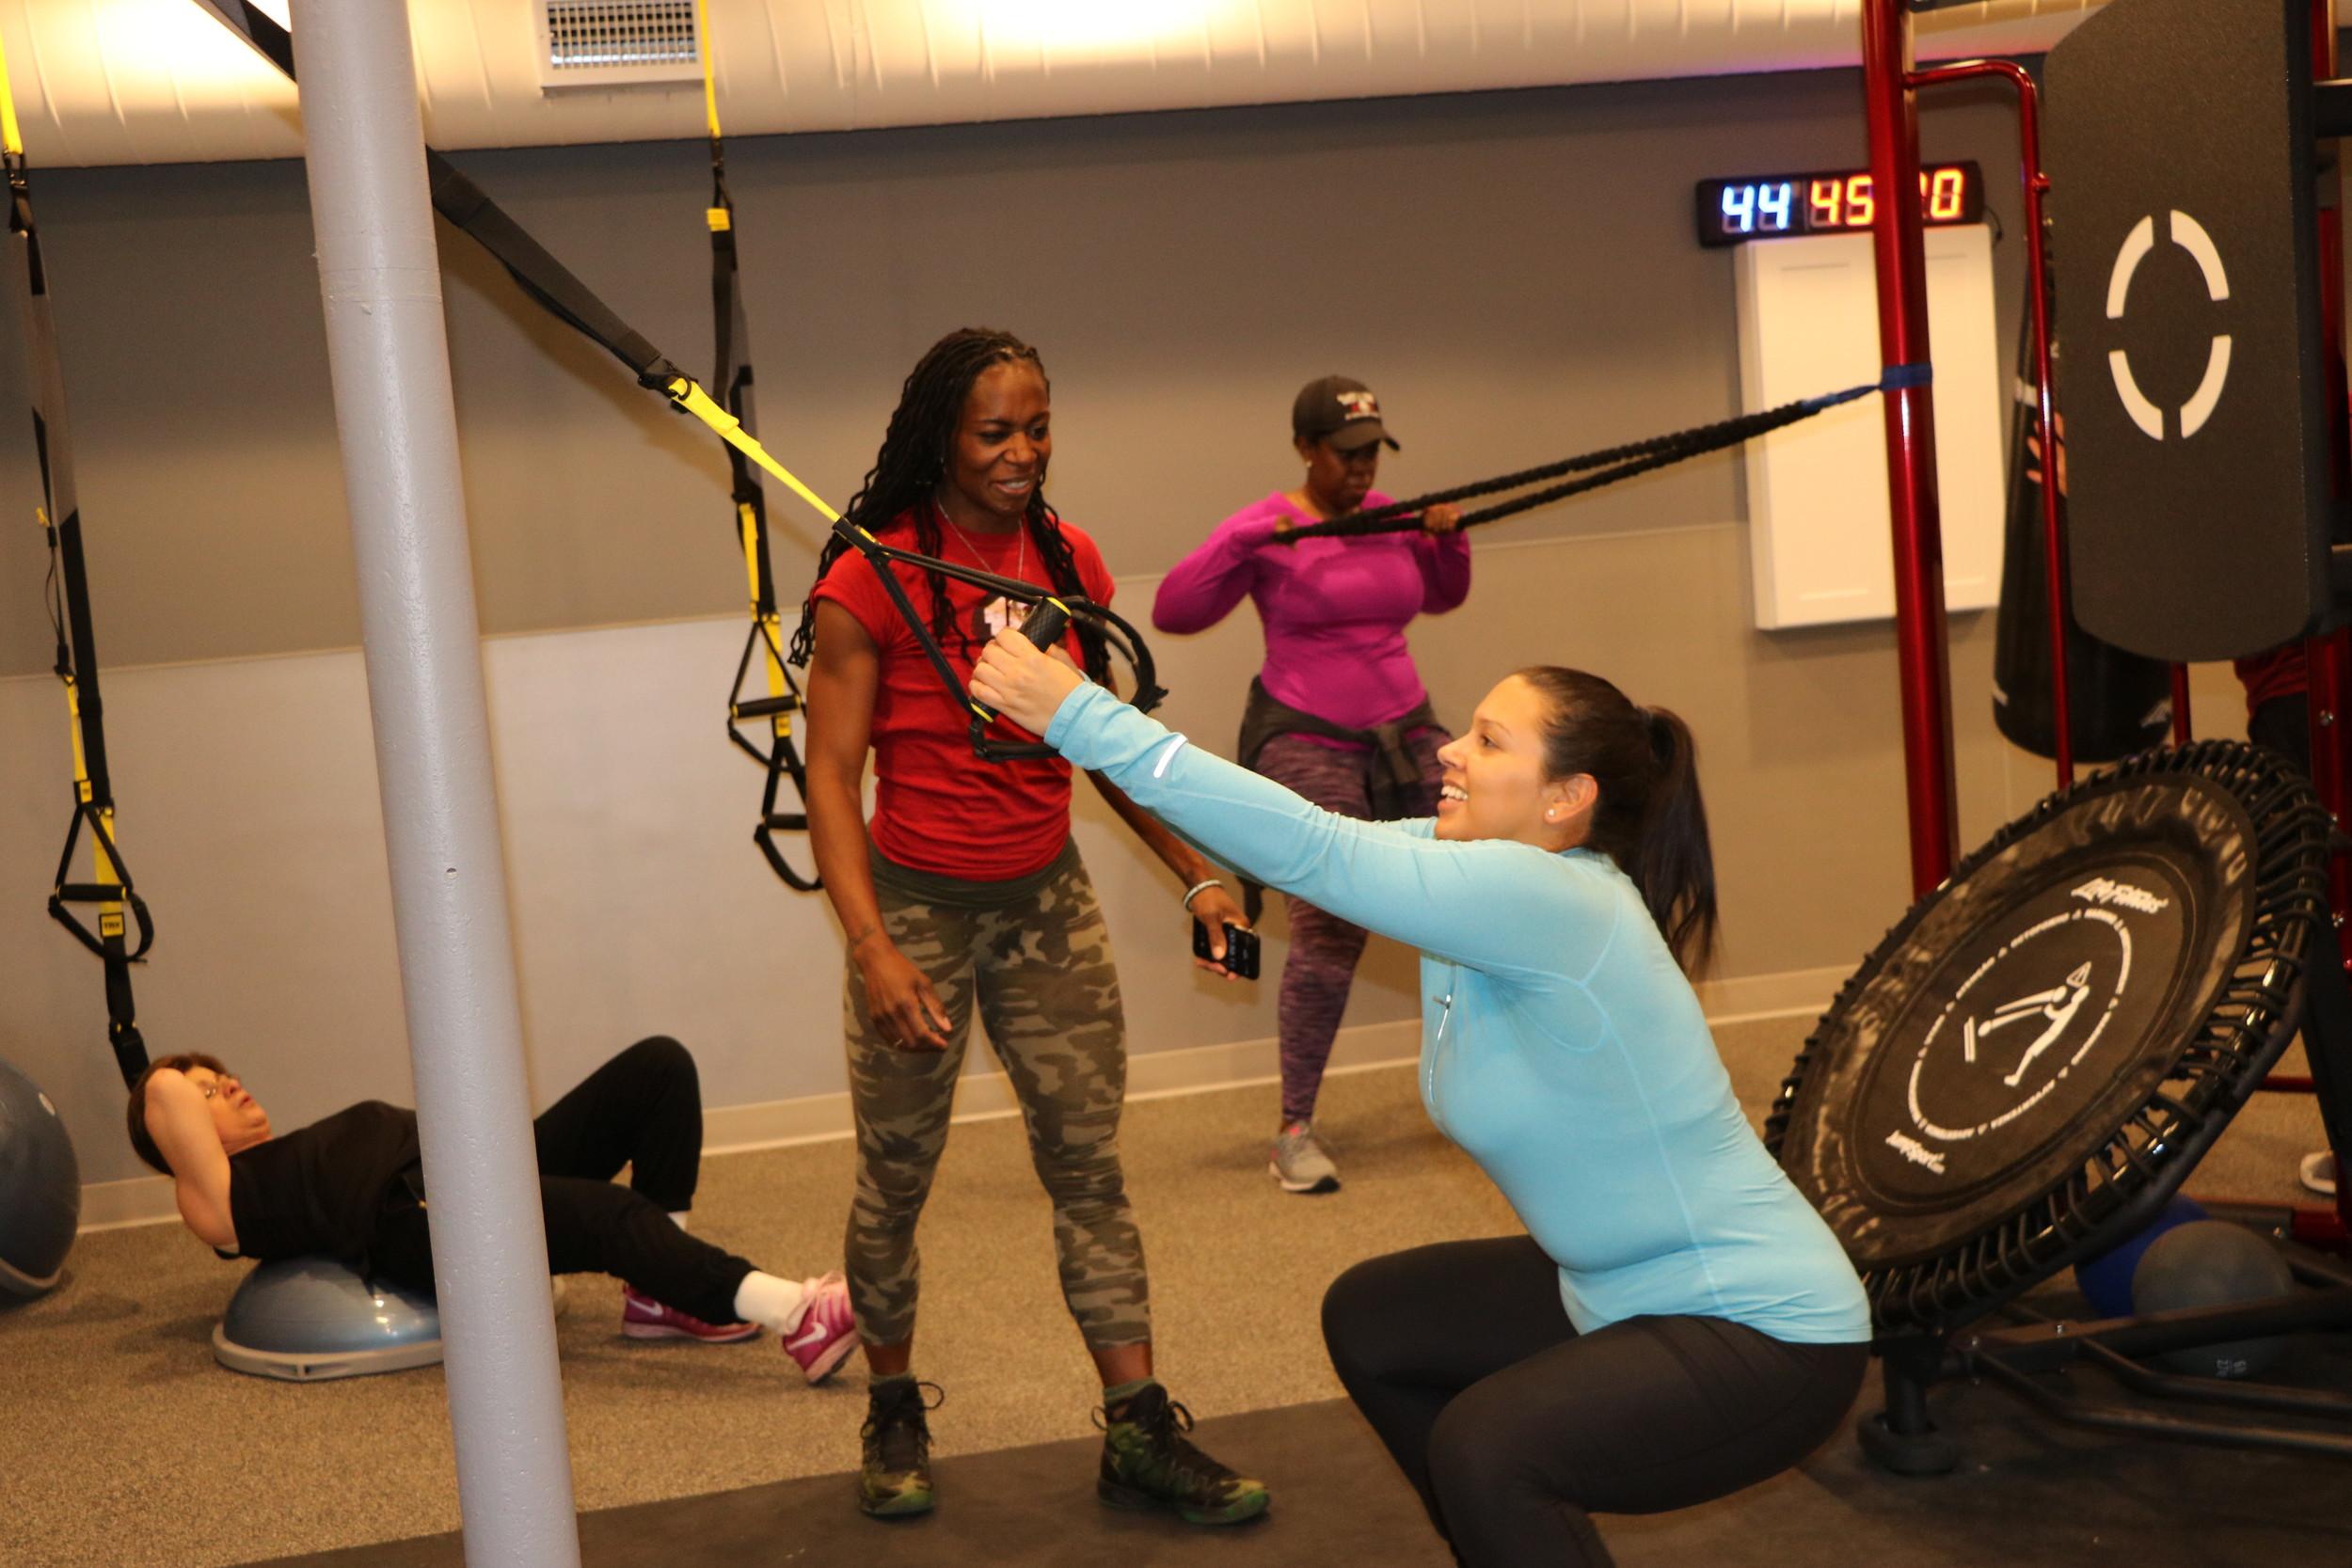 Fitness 19 Opens In Malverne Herald Community Newspapers Www Liherald Com